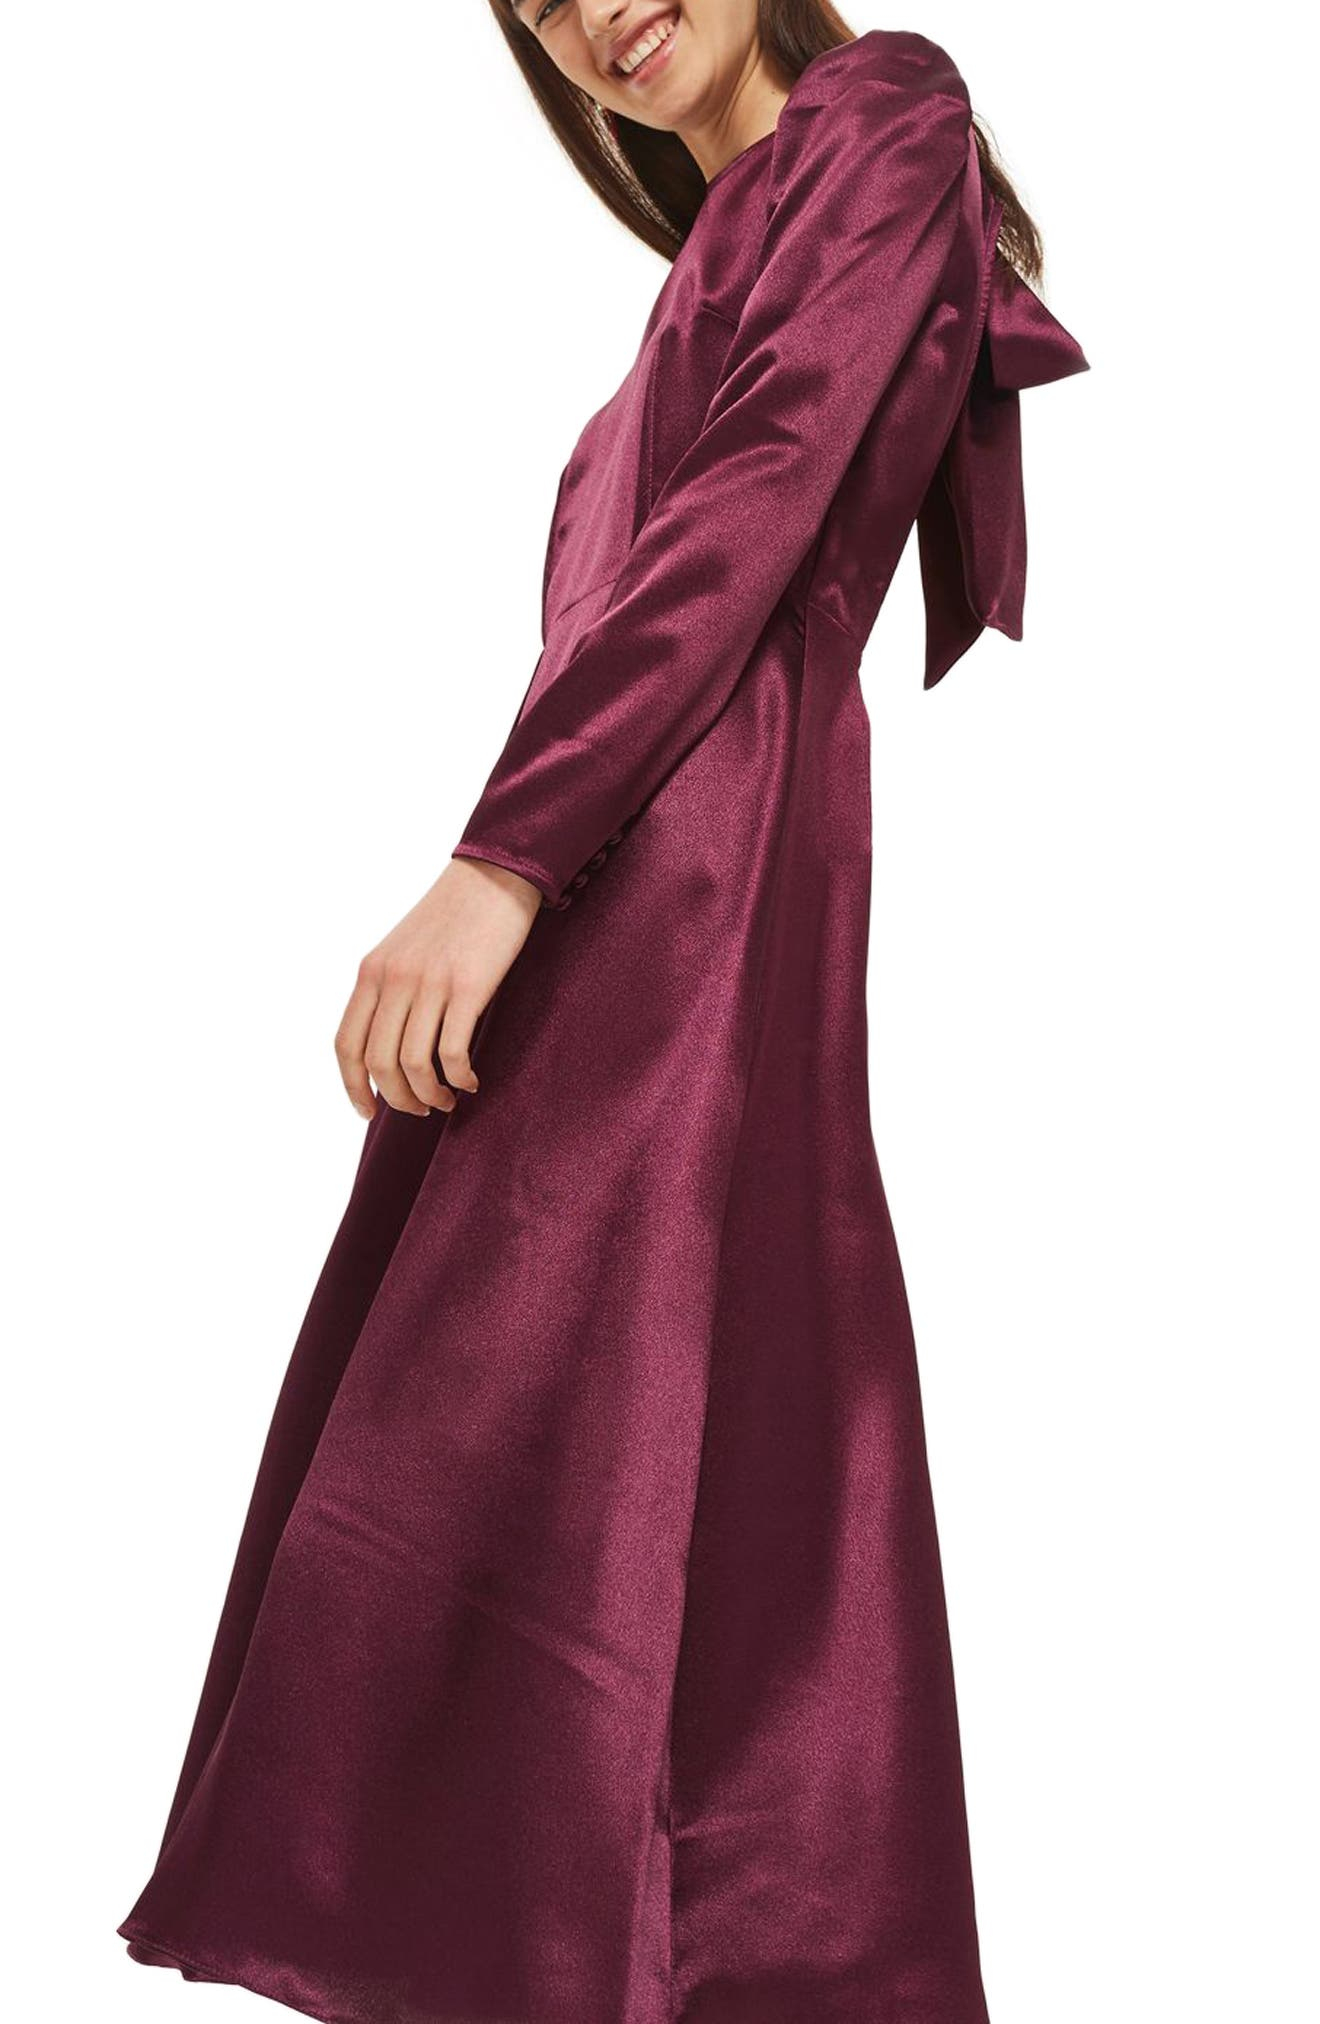 Shimmer Satin Tie Back Midi Dress,                             Alternate thumbnail 3, color,                             Burgundy